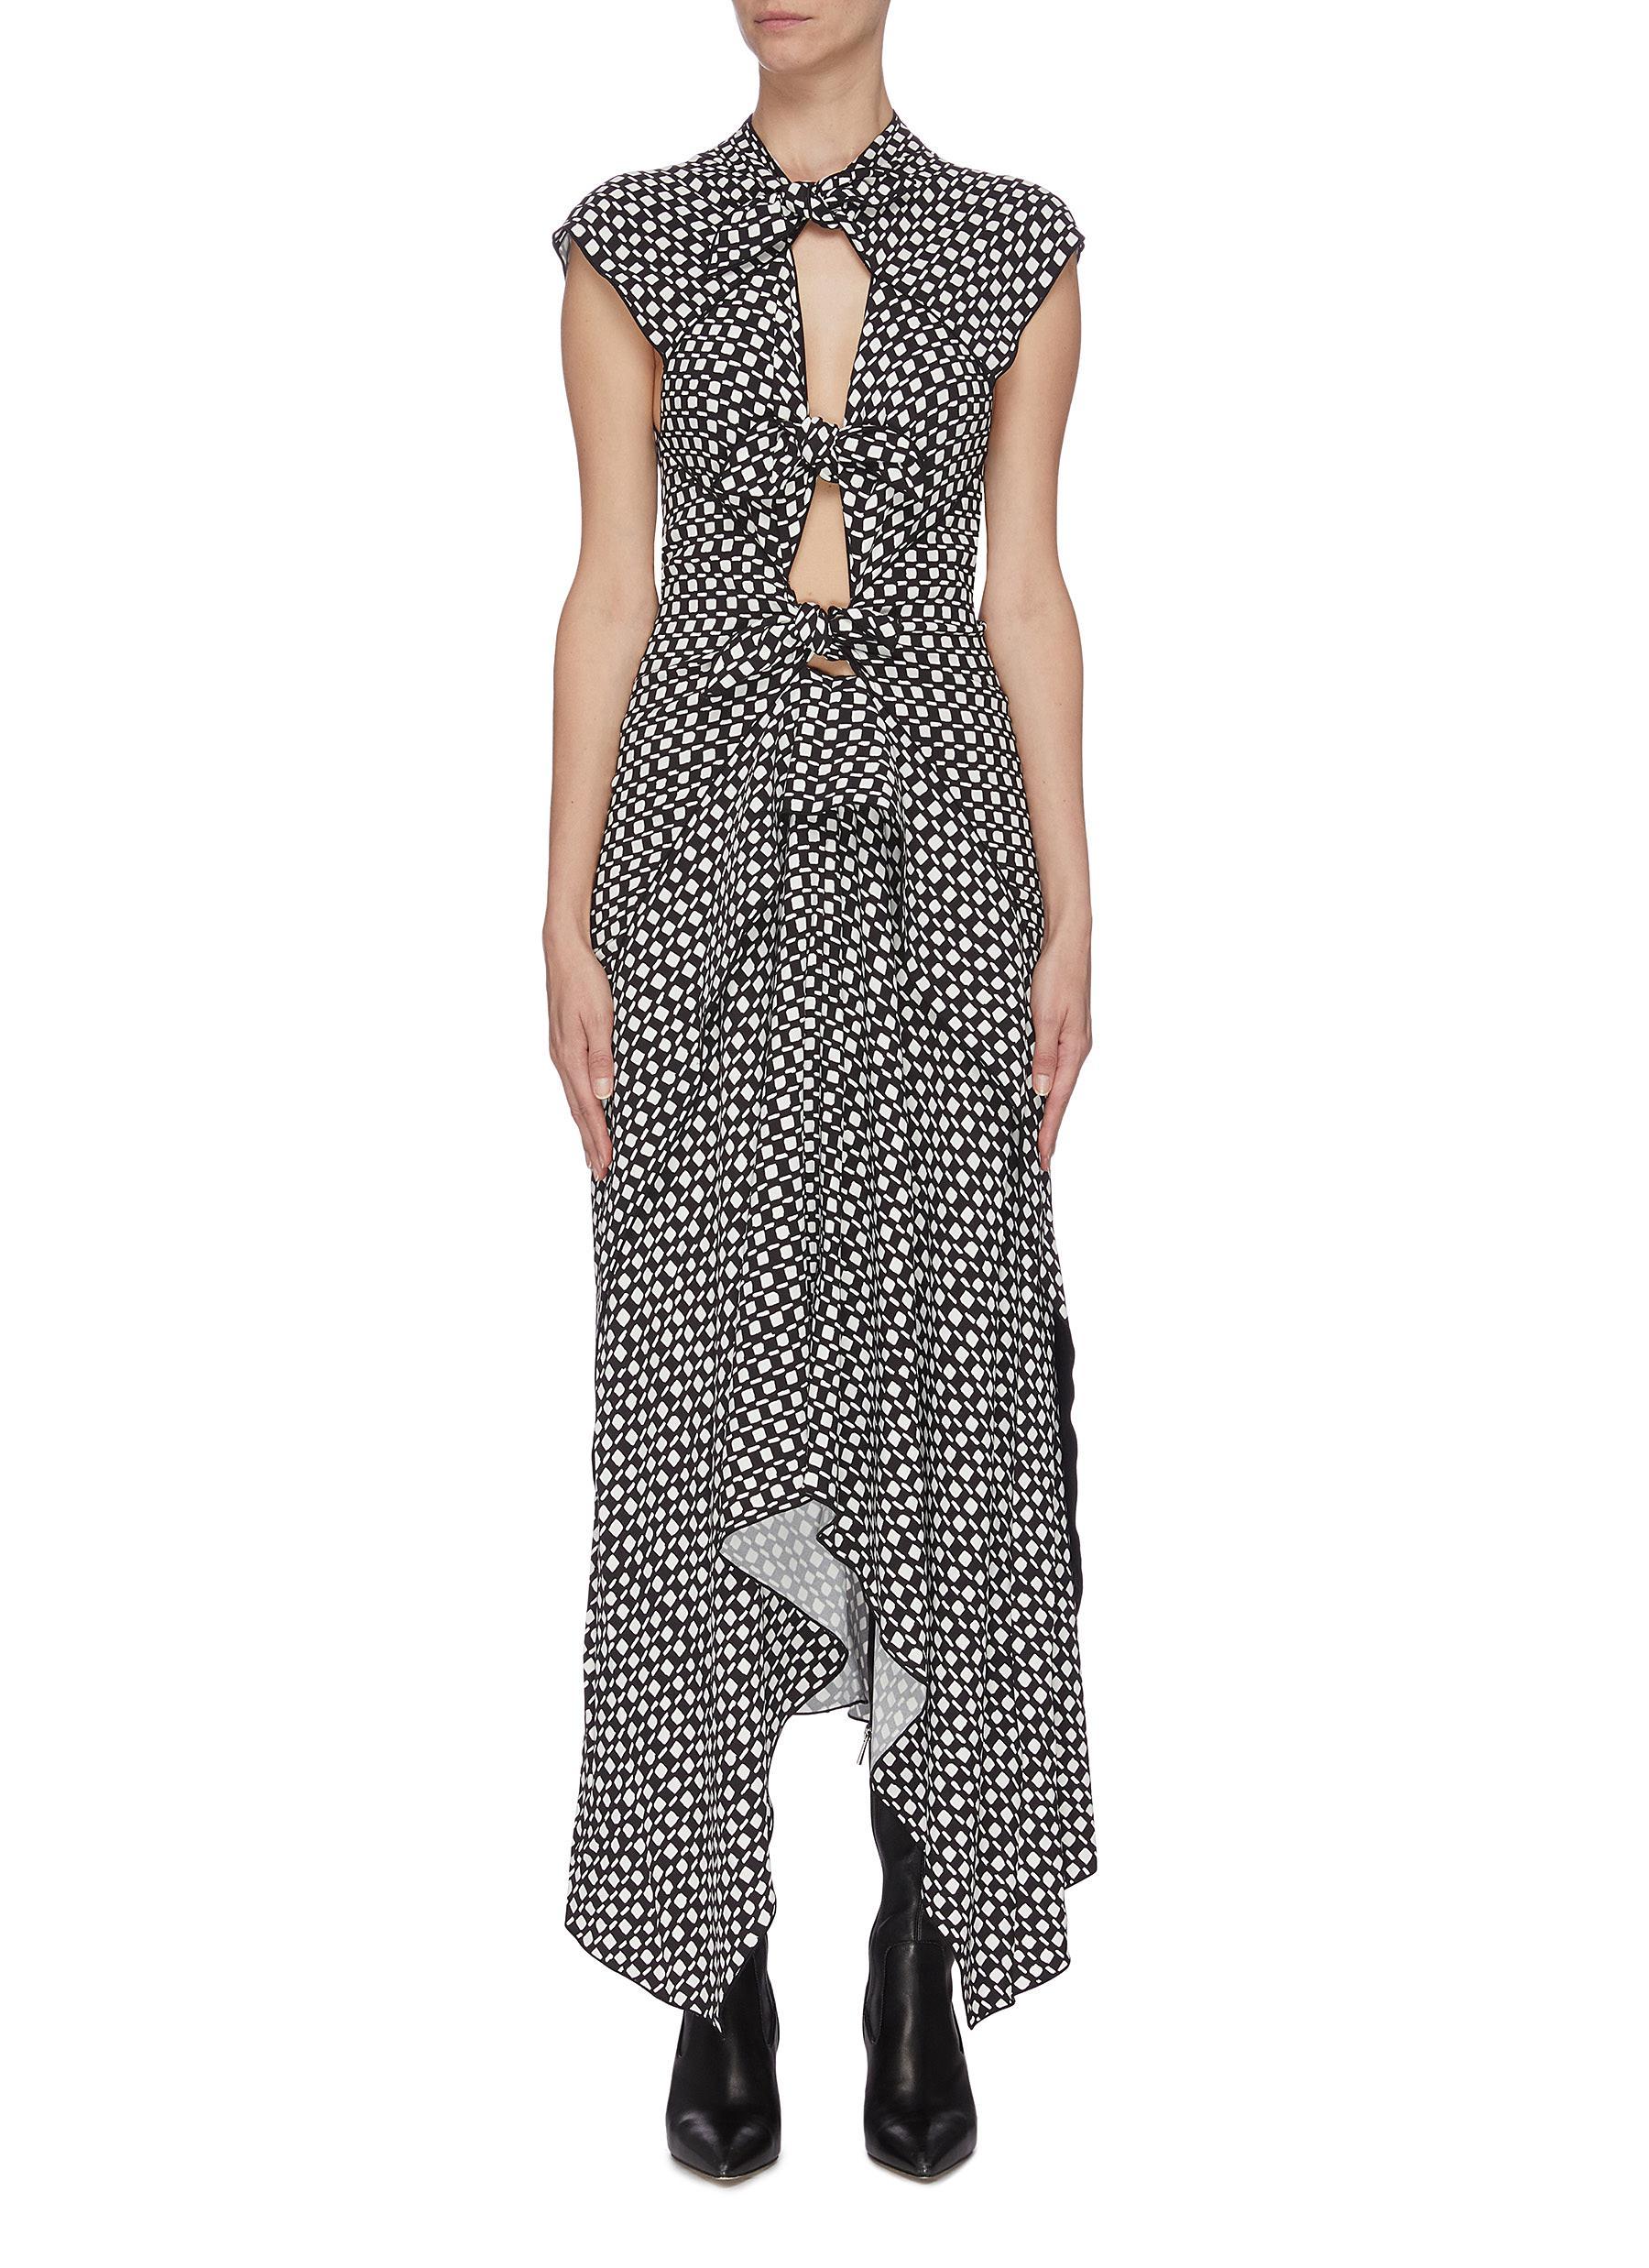 Buy Proenza Schouler Dresses Polka dot cutout gathered handkerchief sleeveless midi dress